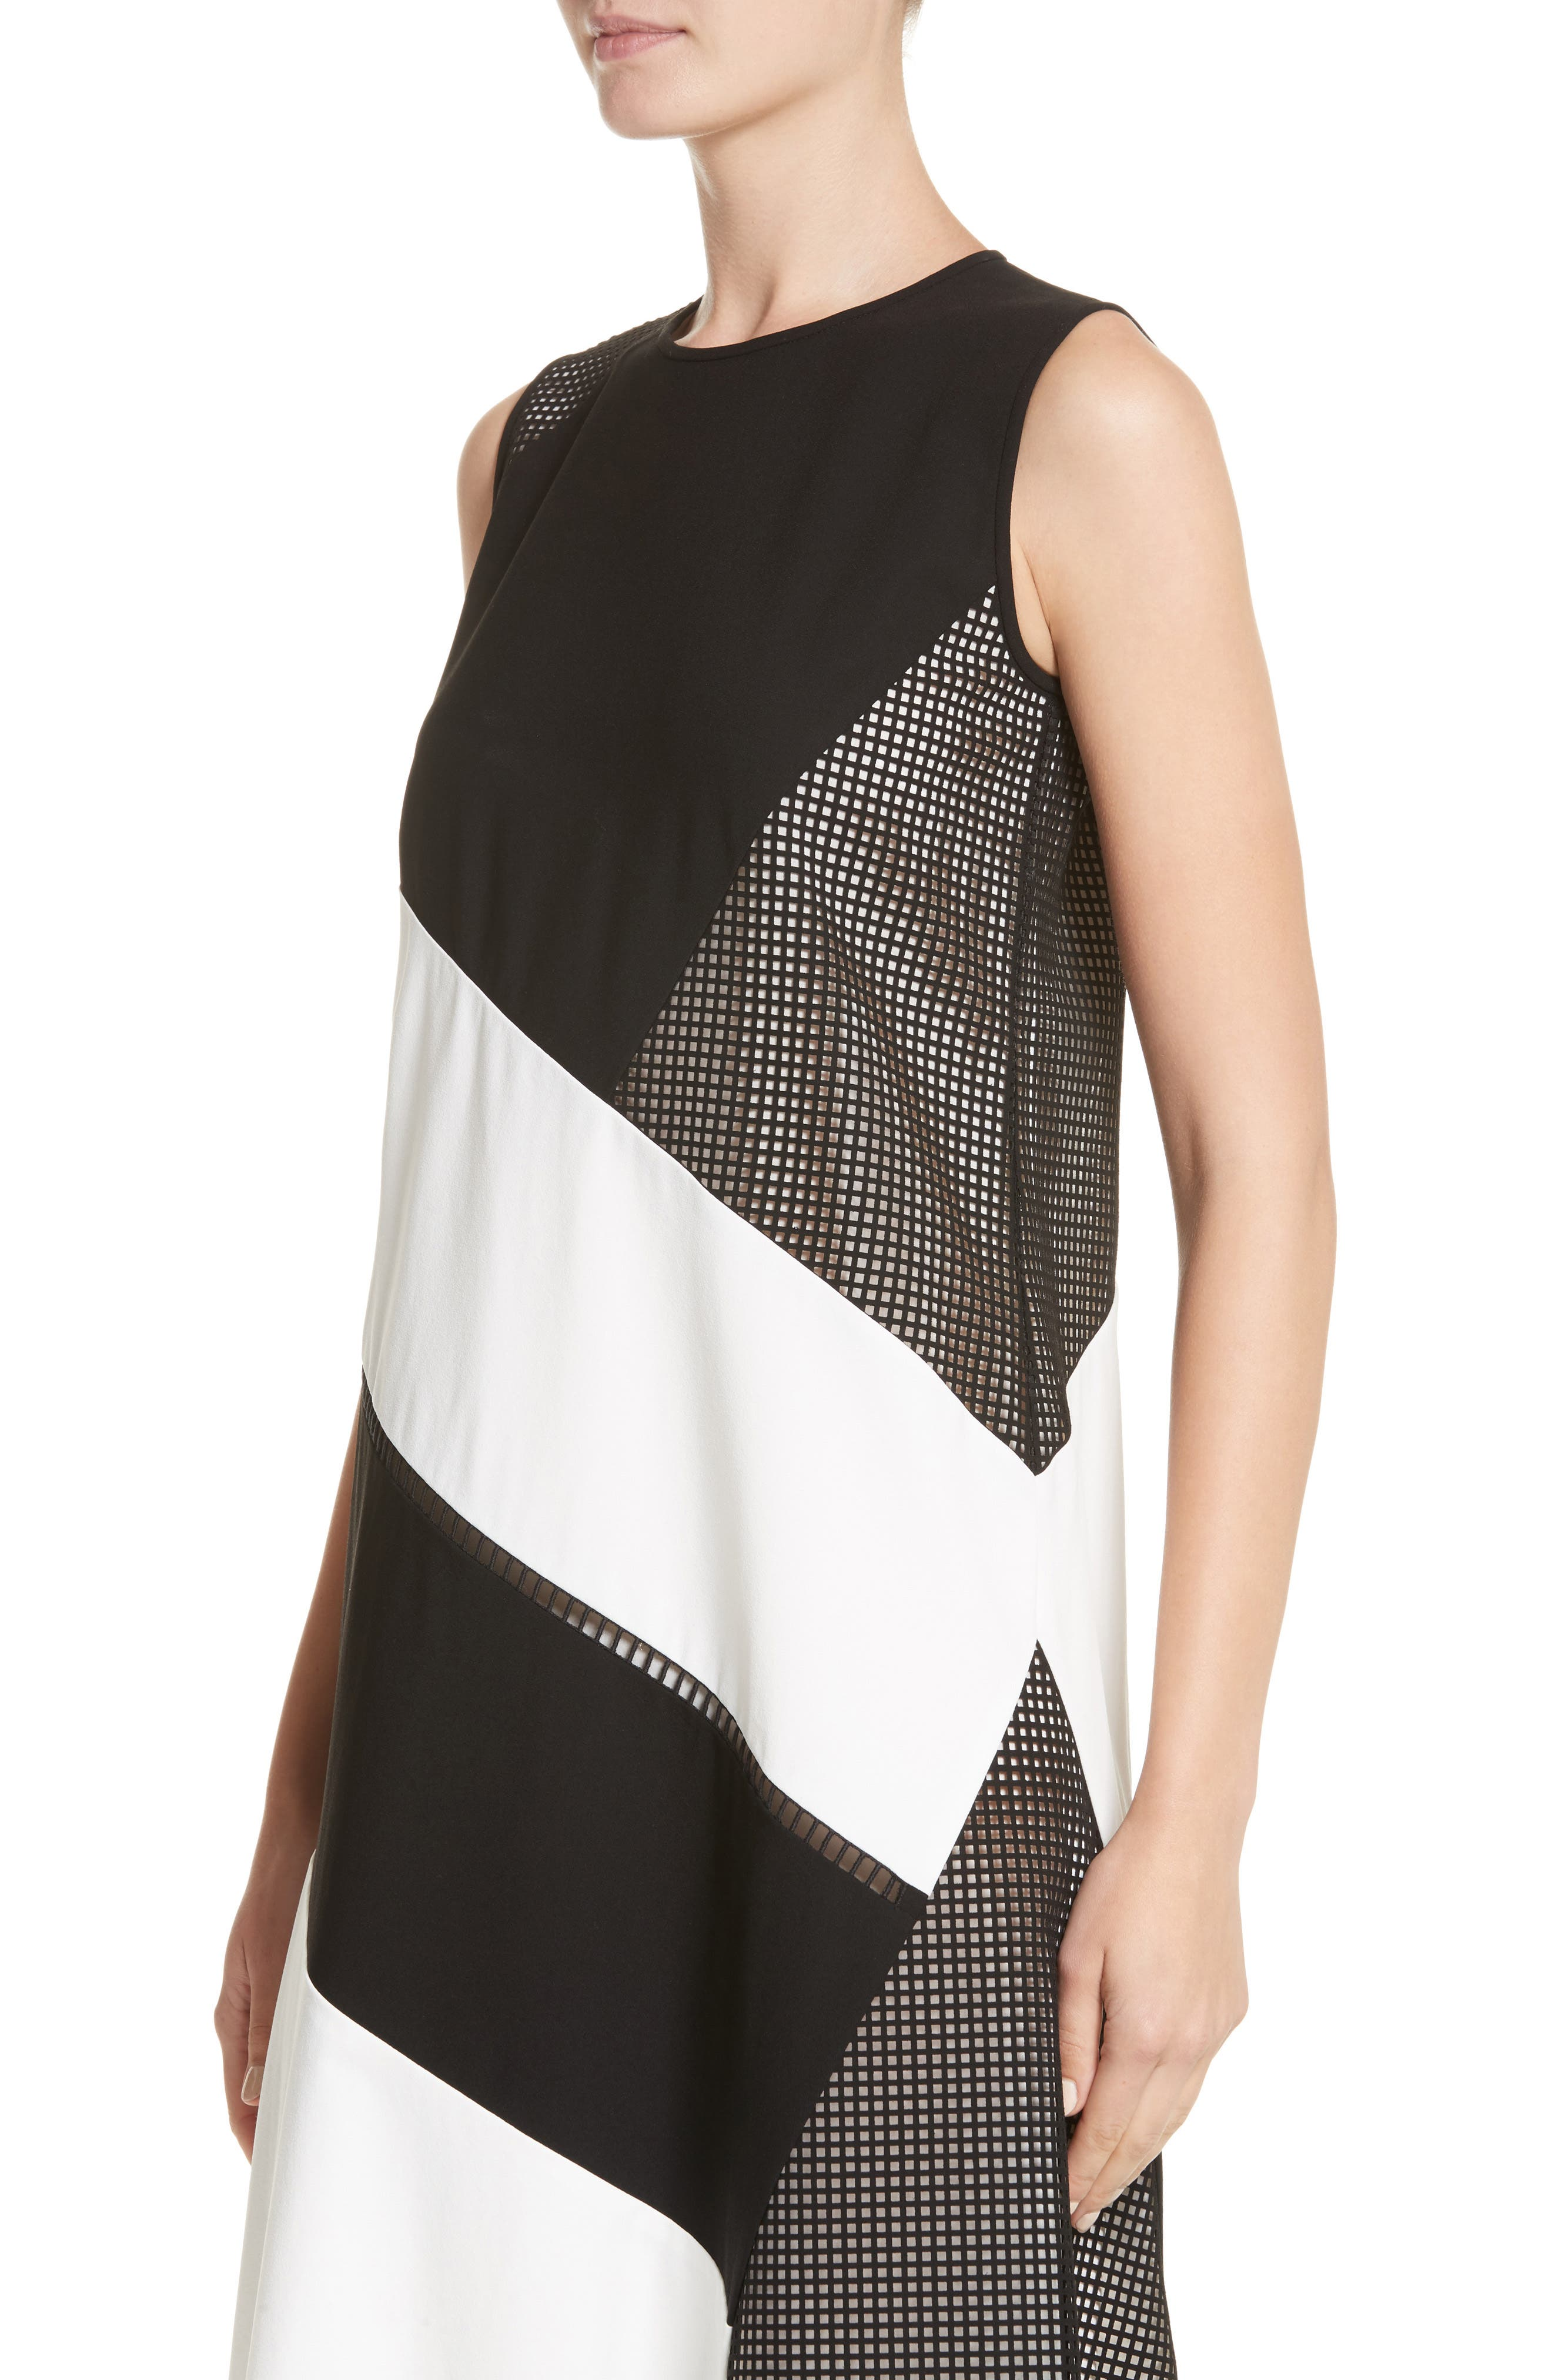 Nuri Laser Cut Midi Dress,                             Alternate thumbnail 4, color,                             Black/Cloud